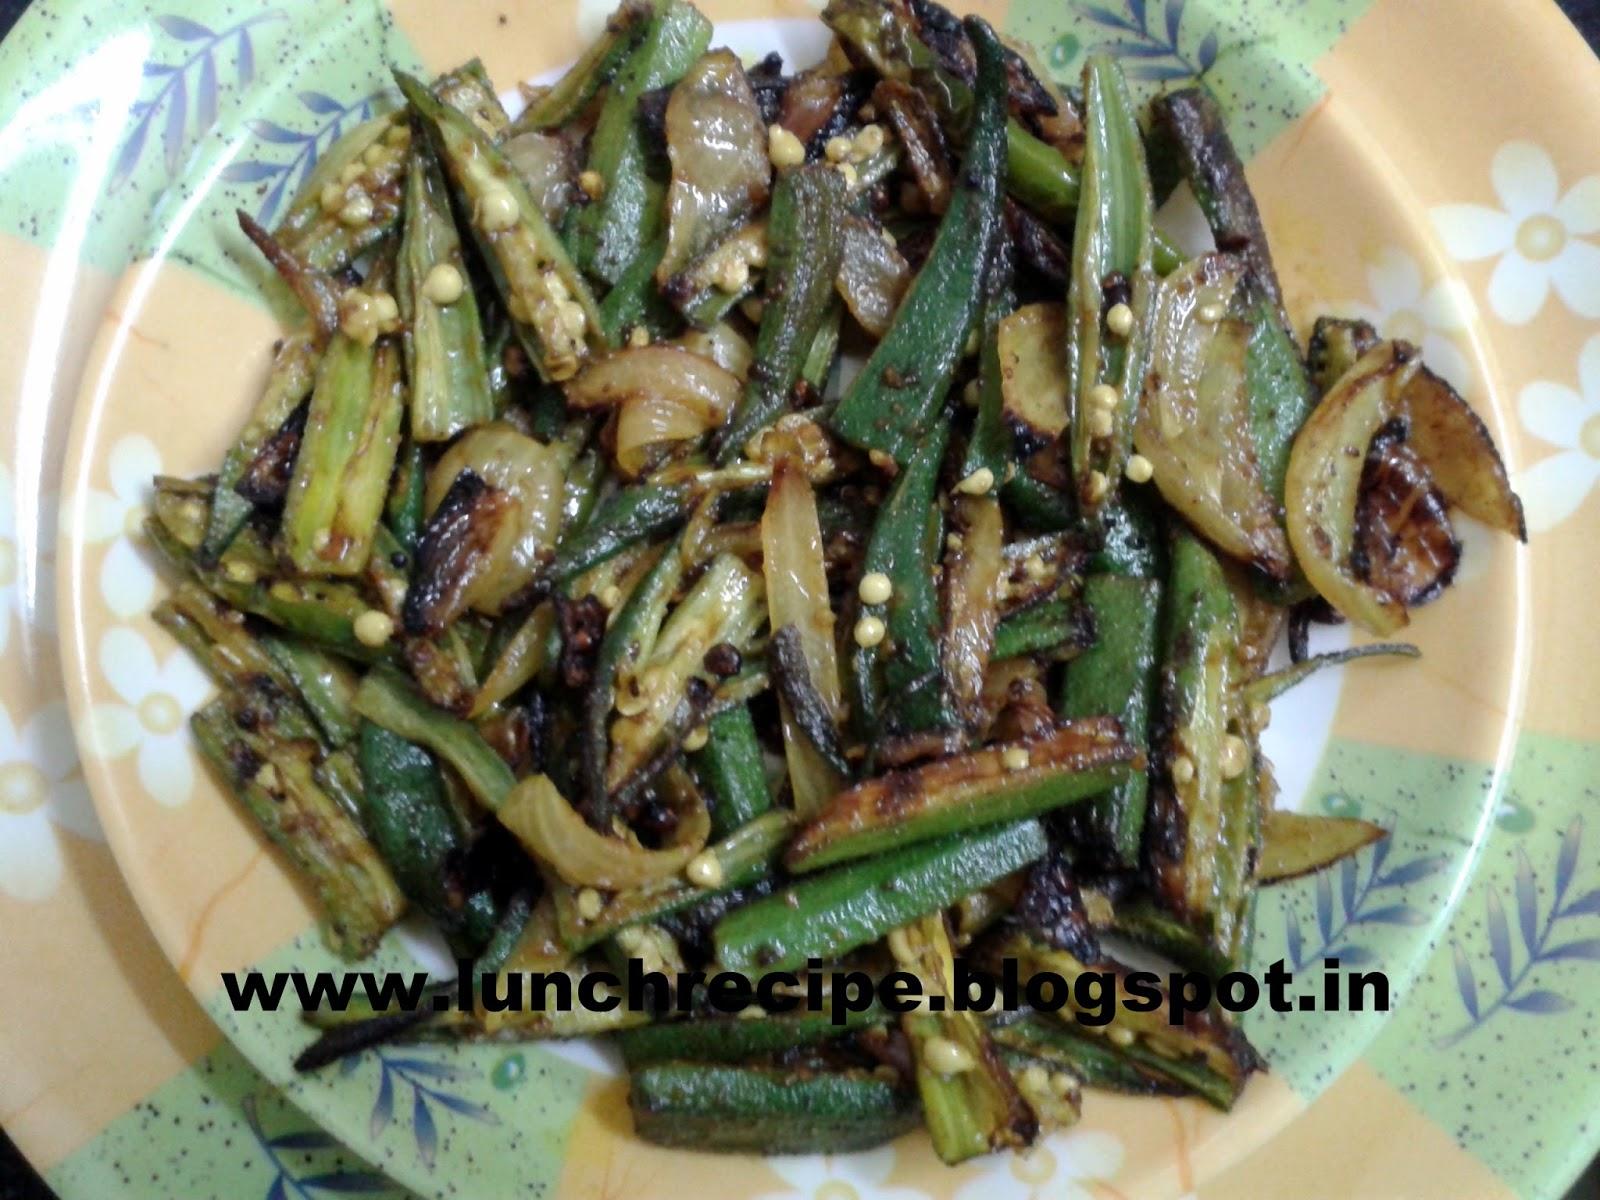 How to make Bhindi Kurkuri Recipe | भिन्डी कुरकुरी | Kurkuri Bhindi | Crispy Okra | Fired Bhindi | Ladies finger fry